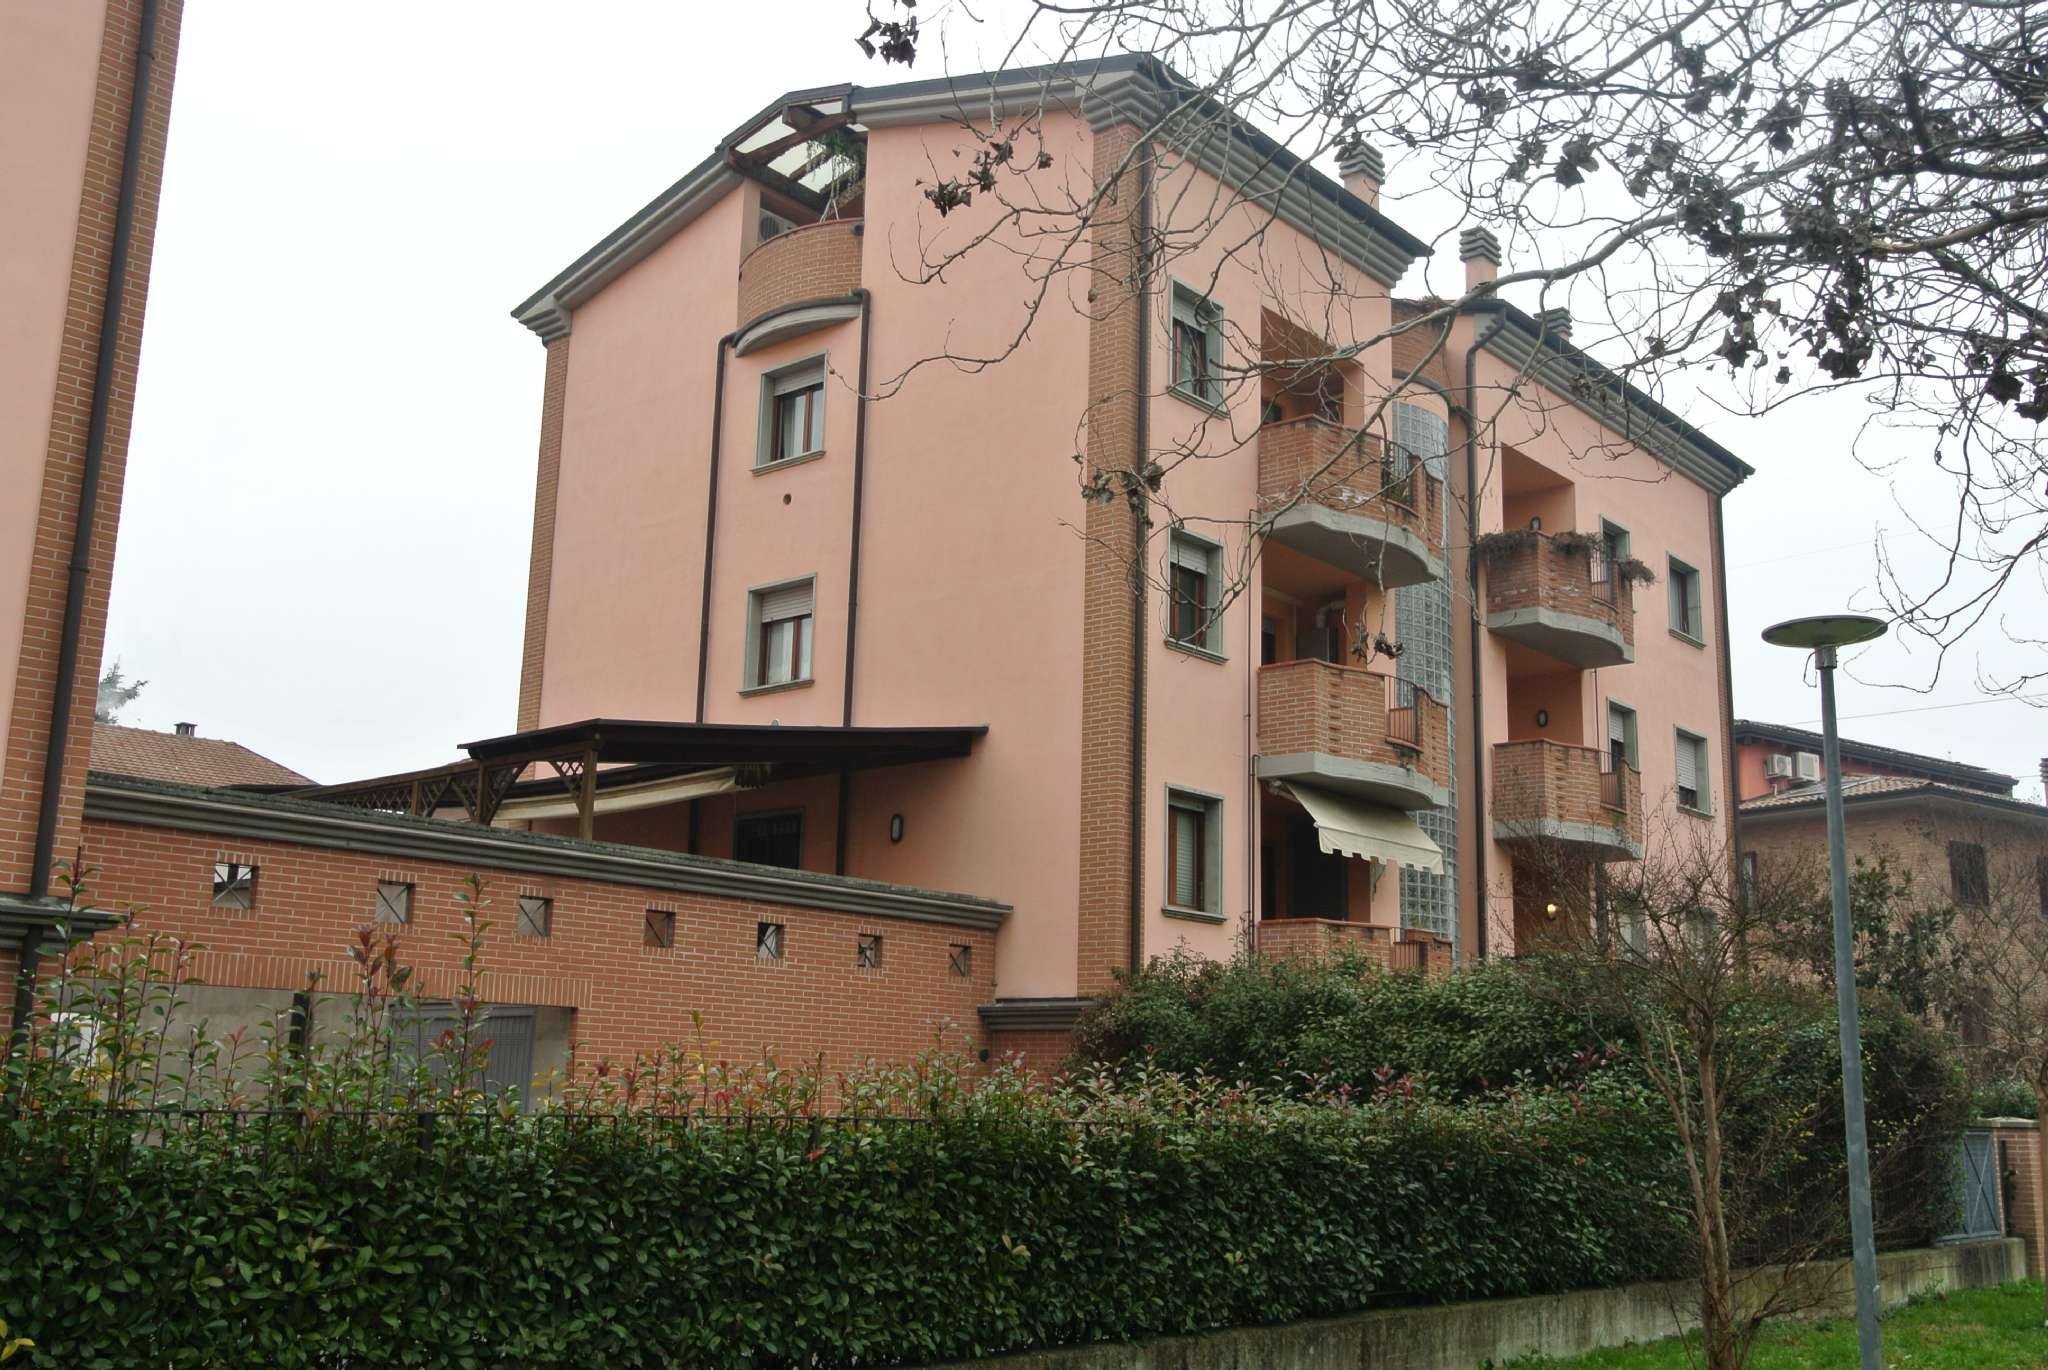 Vendita Tende Da Sole Parma quadrilocale in vendita a parma, case in vendita parma